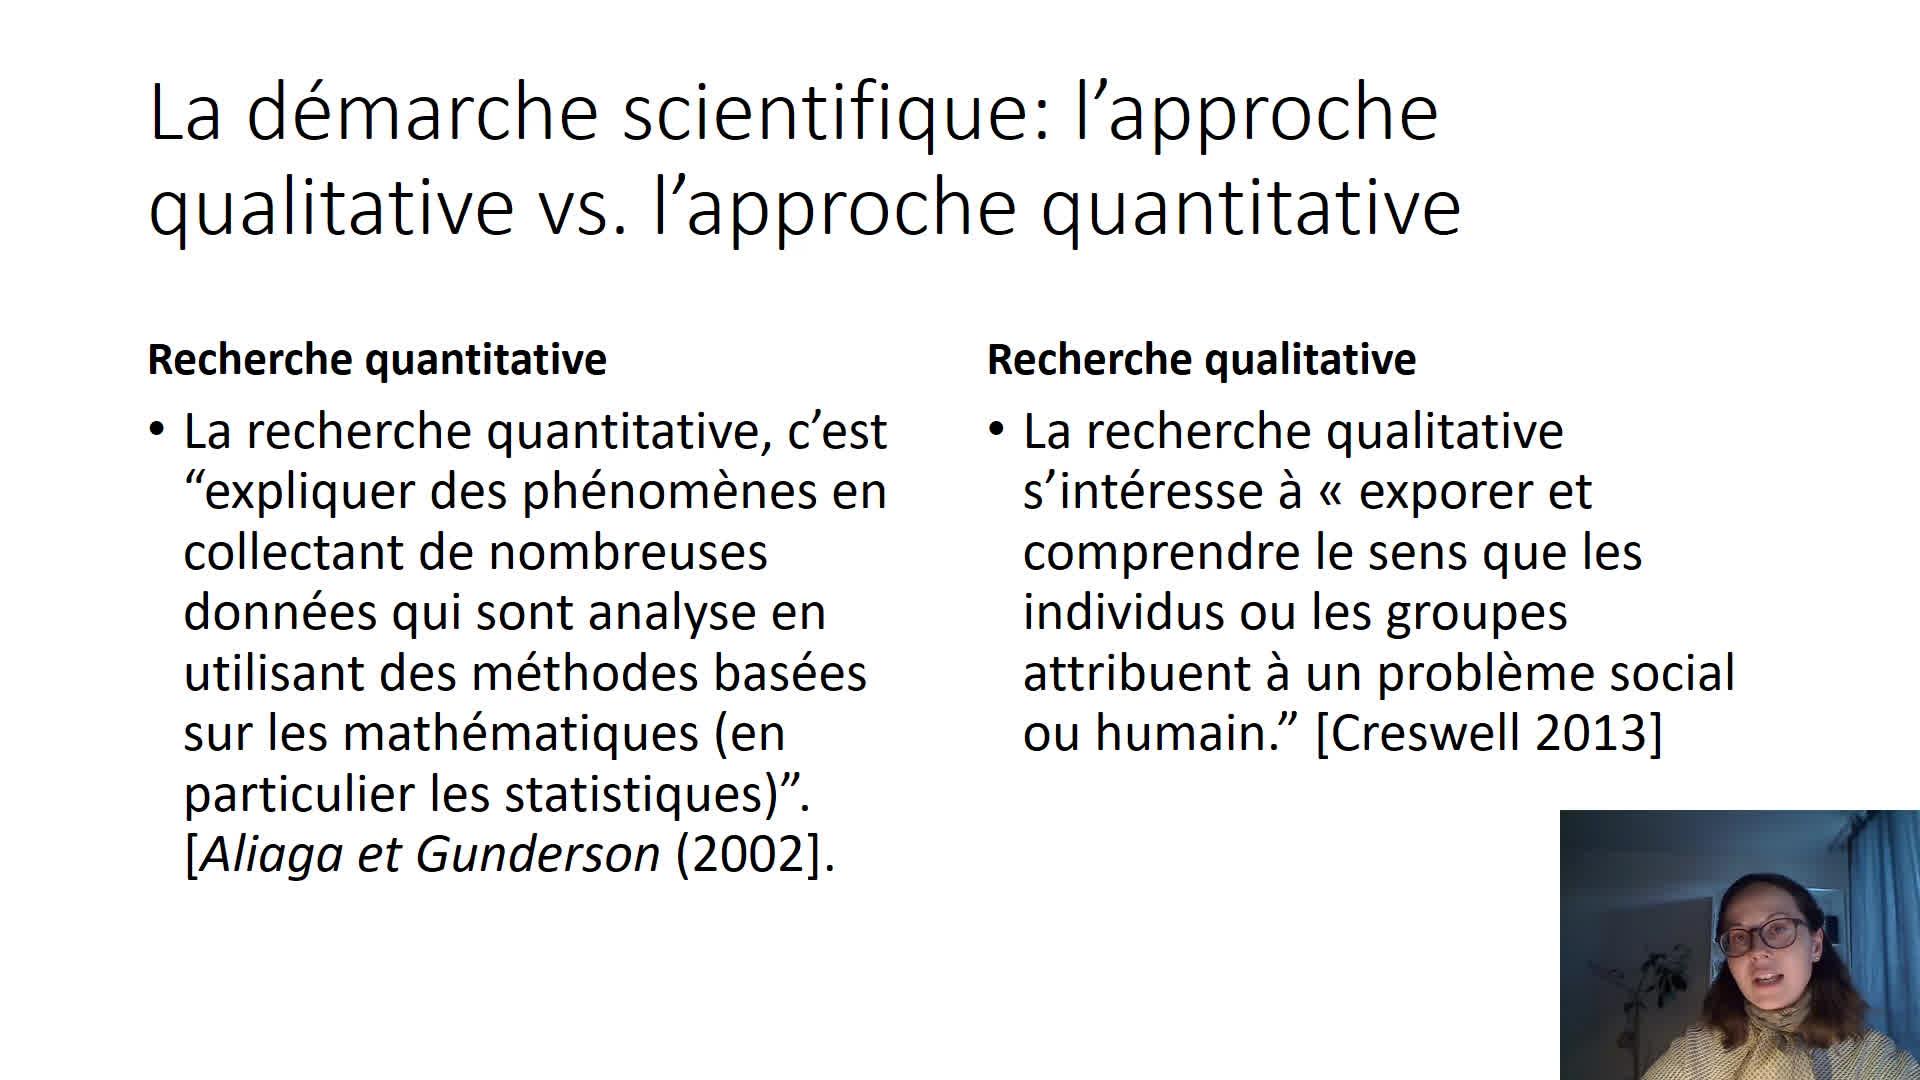 approche quantitative et qualitative